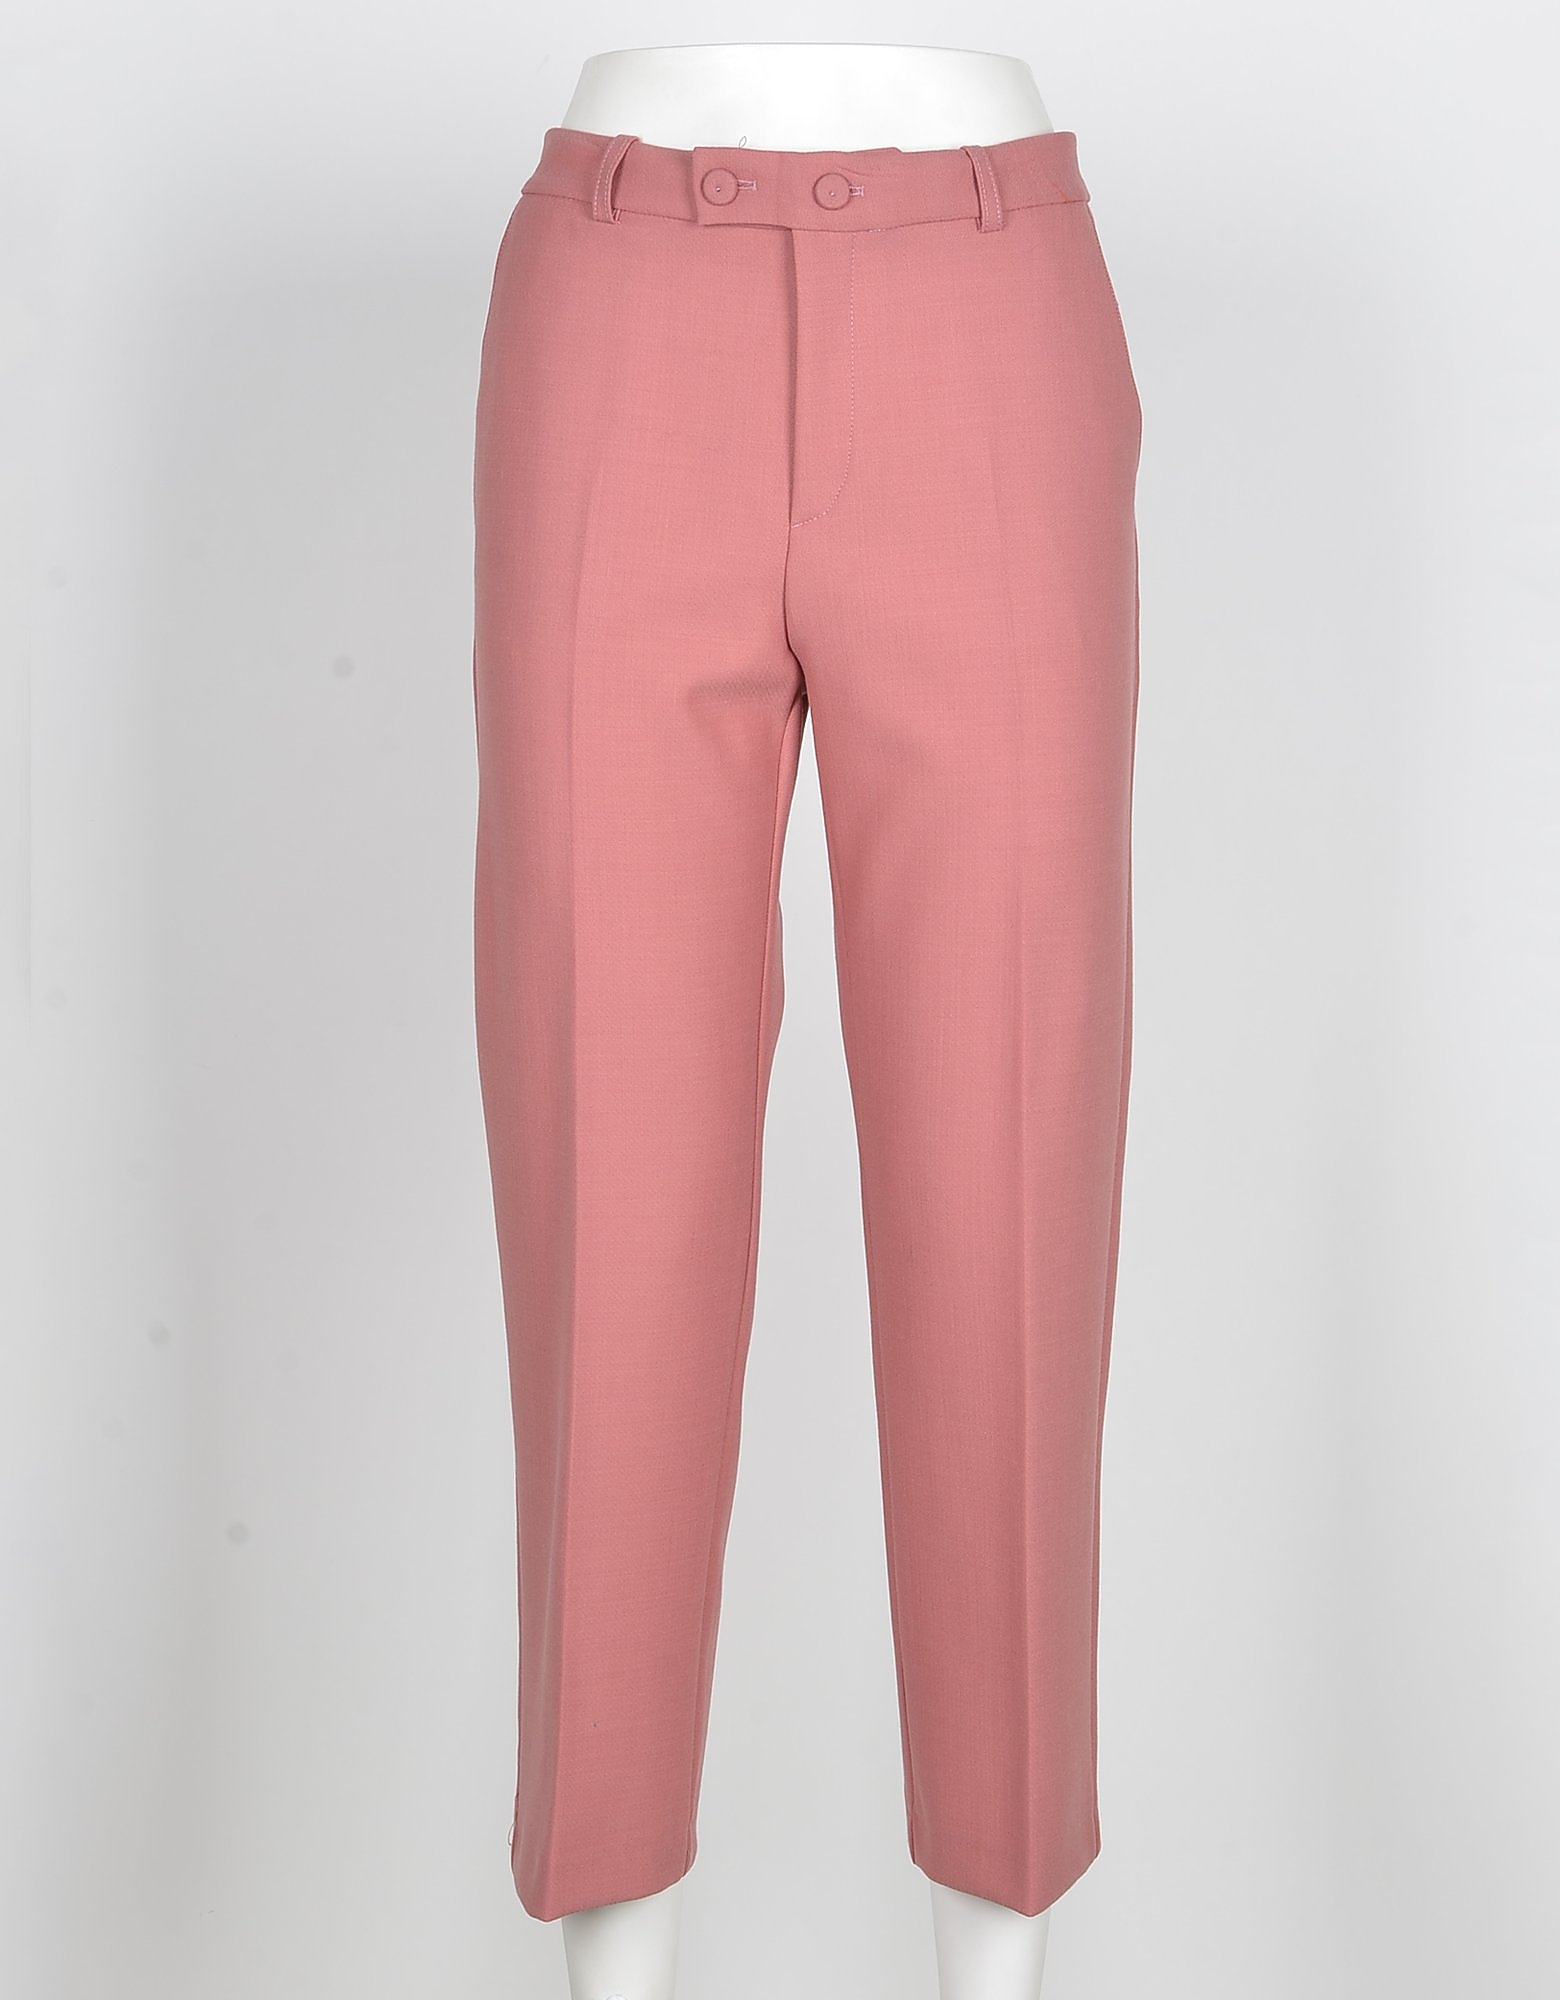 Pinko Designer Pants, Women's Antique Pink Pants